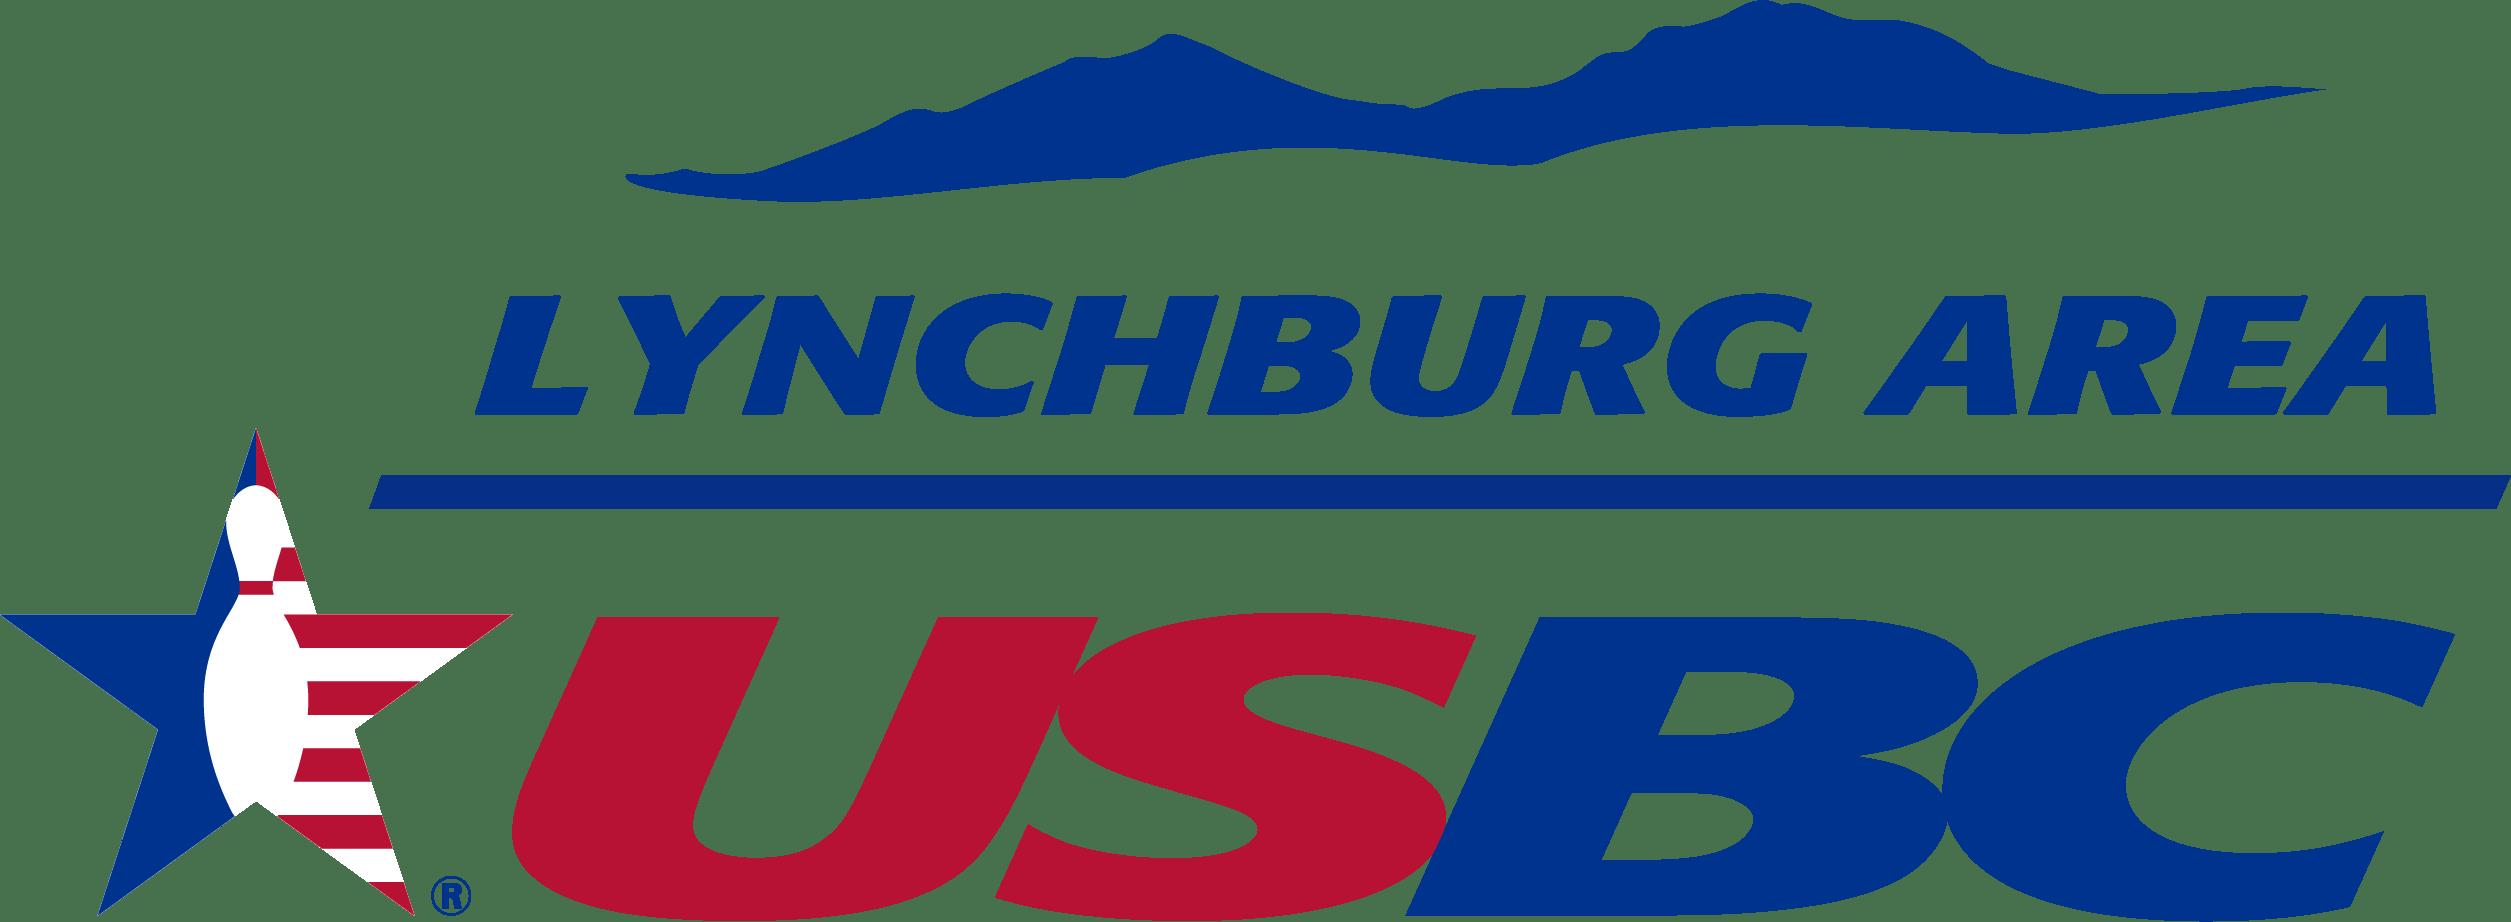 Lyncbhburg Area USBC